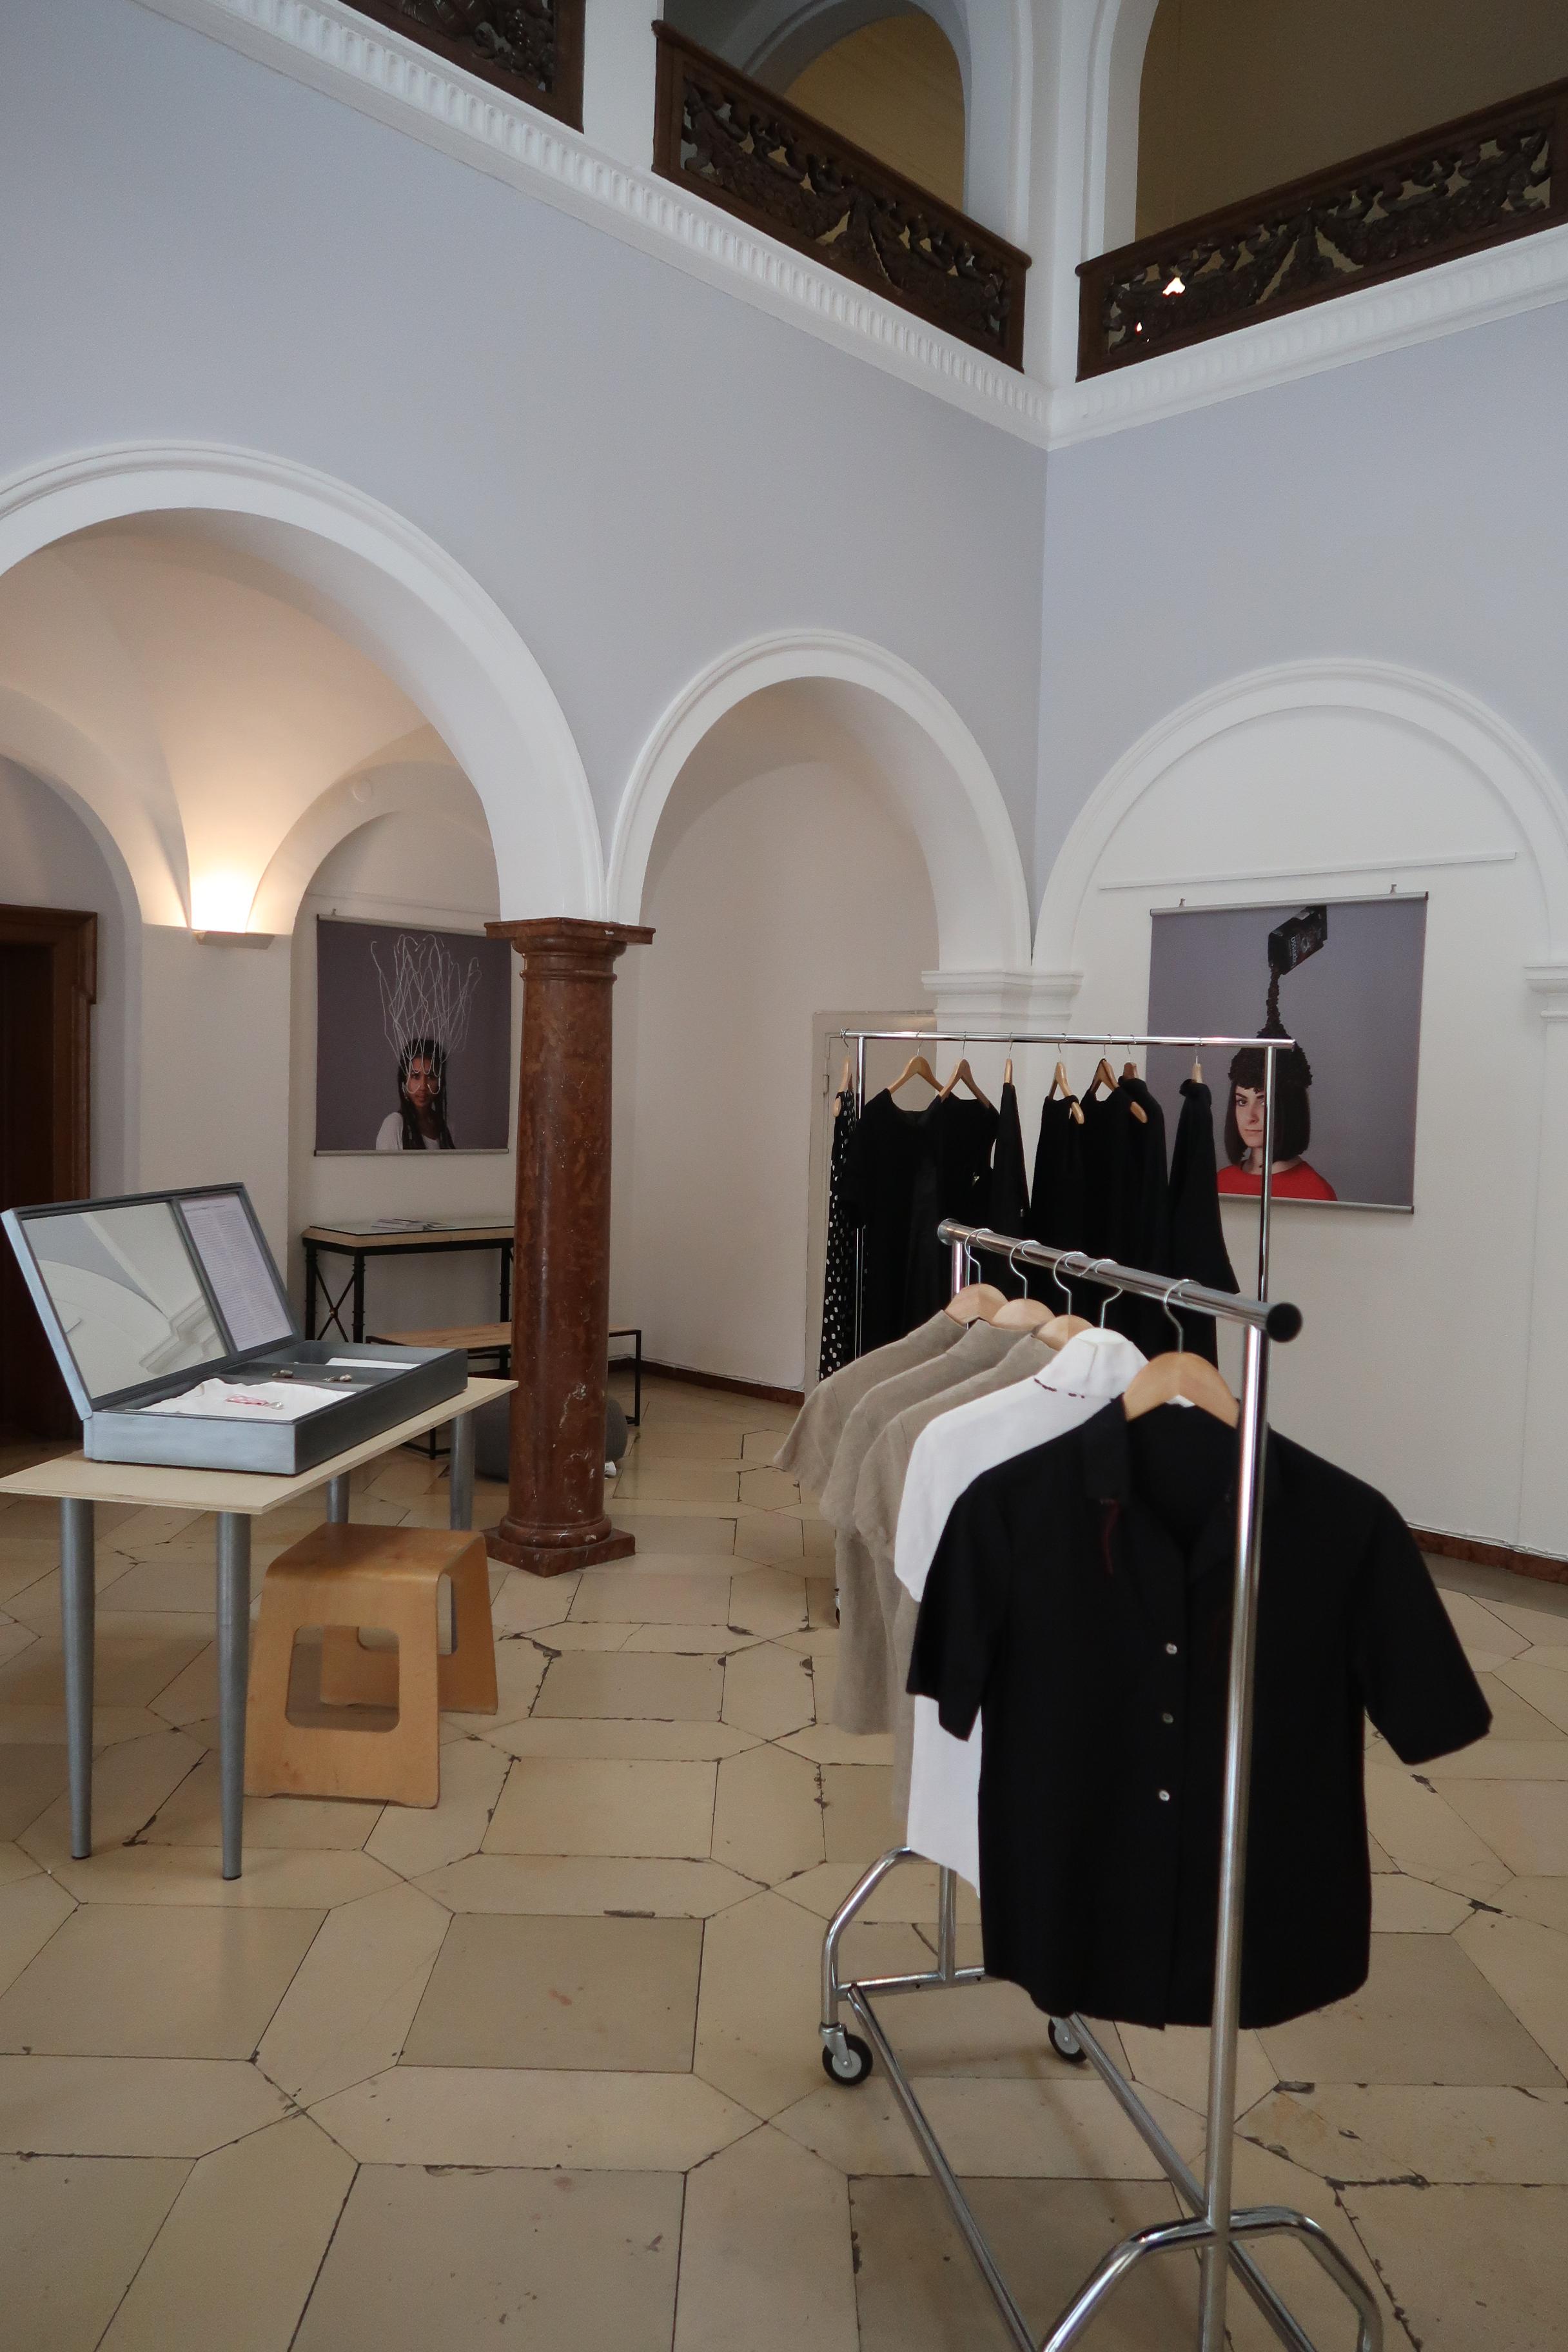 Monika Brugger, Institut français München, 14 maart 2020. Foto Coert Peter Krabbe, tentoonstelling, kleding, sieraden, textiel